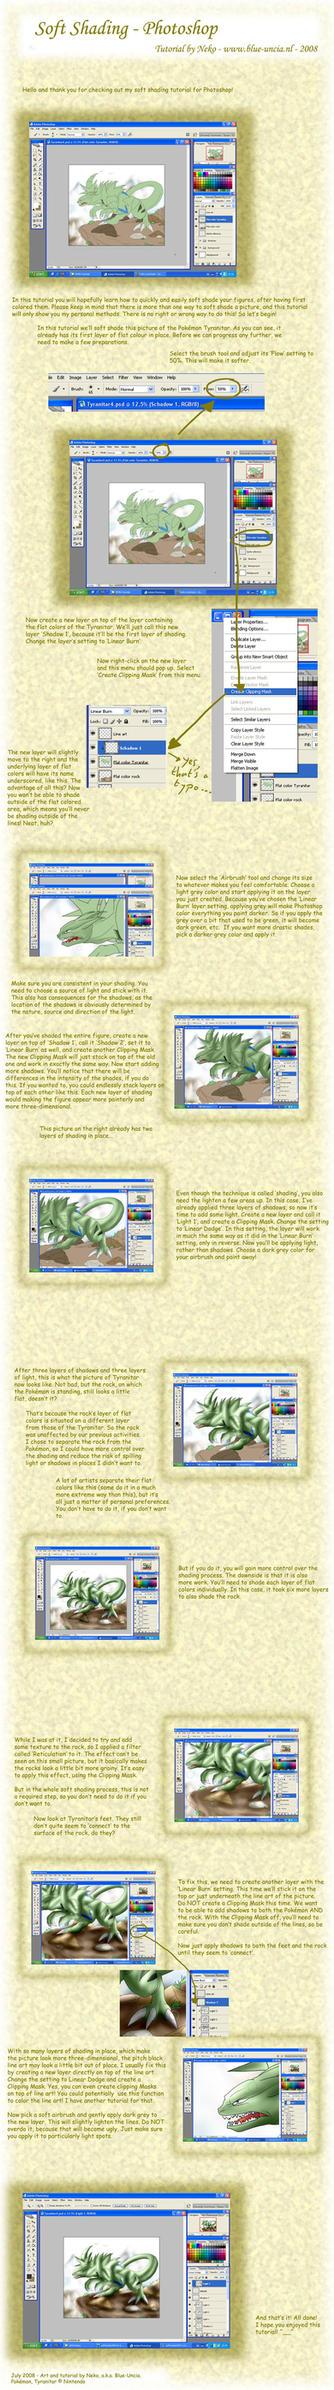 Soft shading tutorial by Blue-Uncia